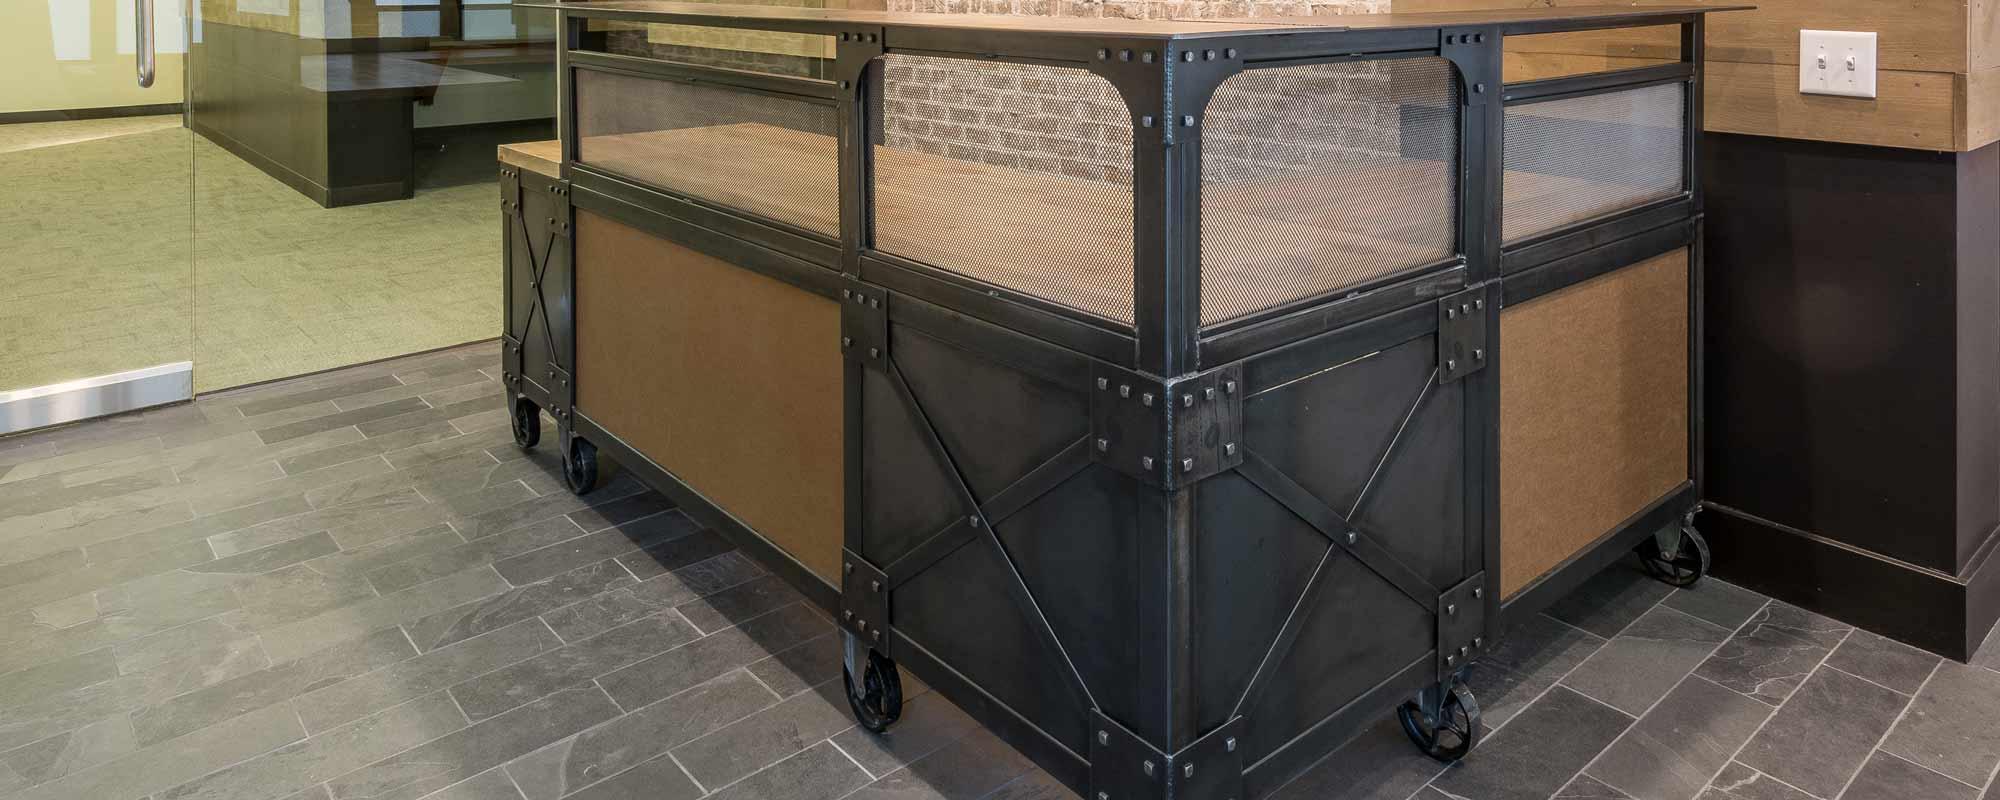 Exceptionnel Real Industrial Edge Furniture | Custom, Industrial, Vintage ...